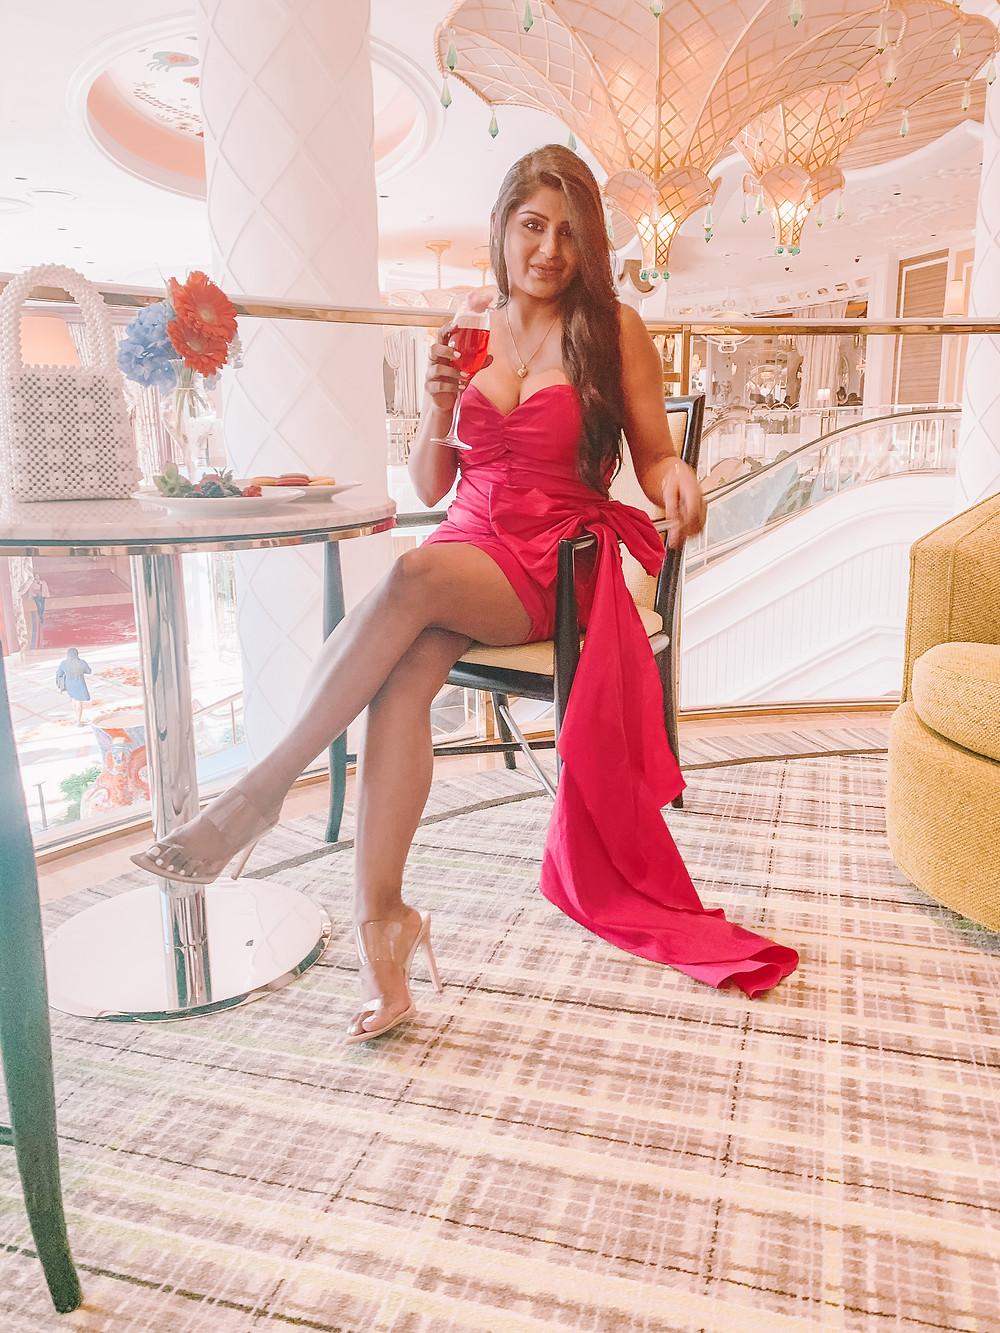 Valenitne's day pink dress